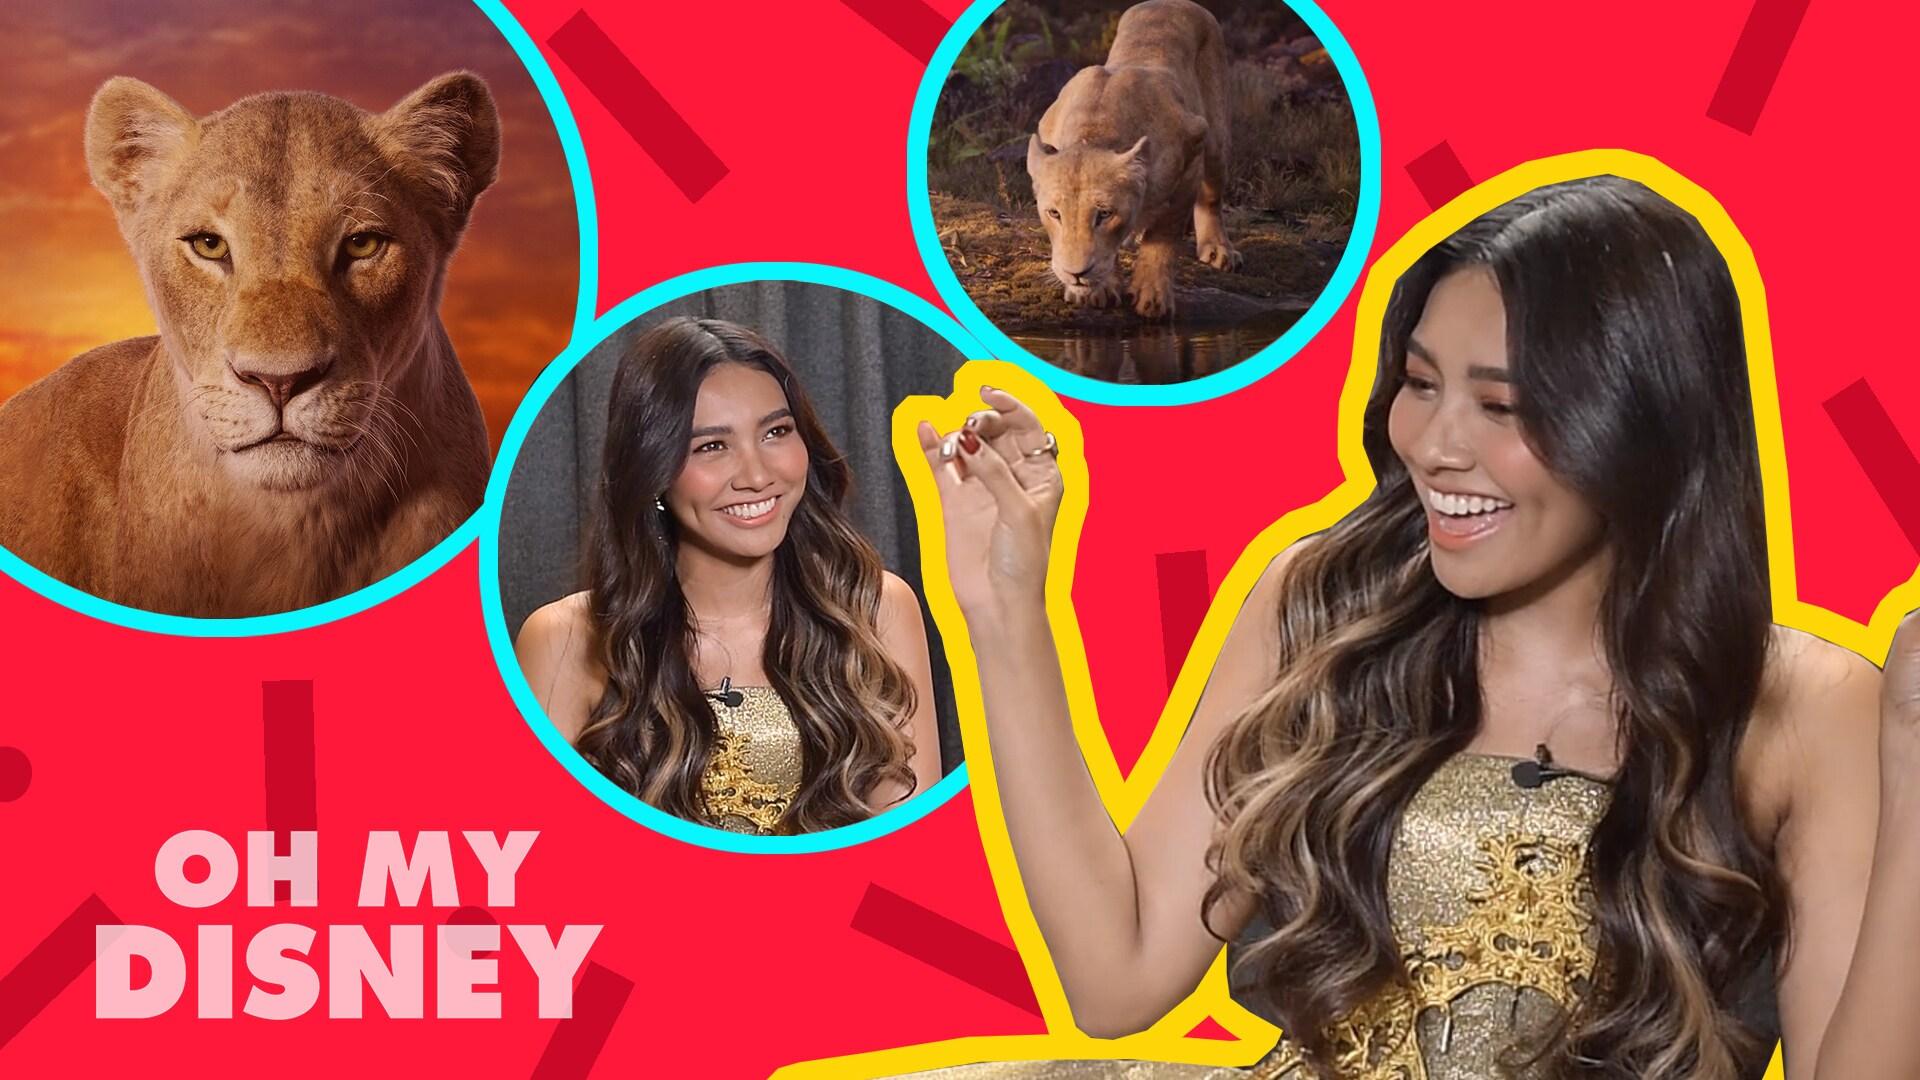 Disney Session - แก้ม วิชญาณี จาก Disney's The Lion King